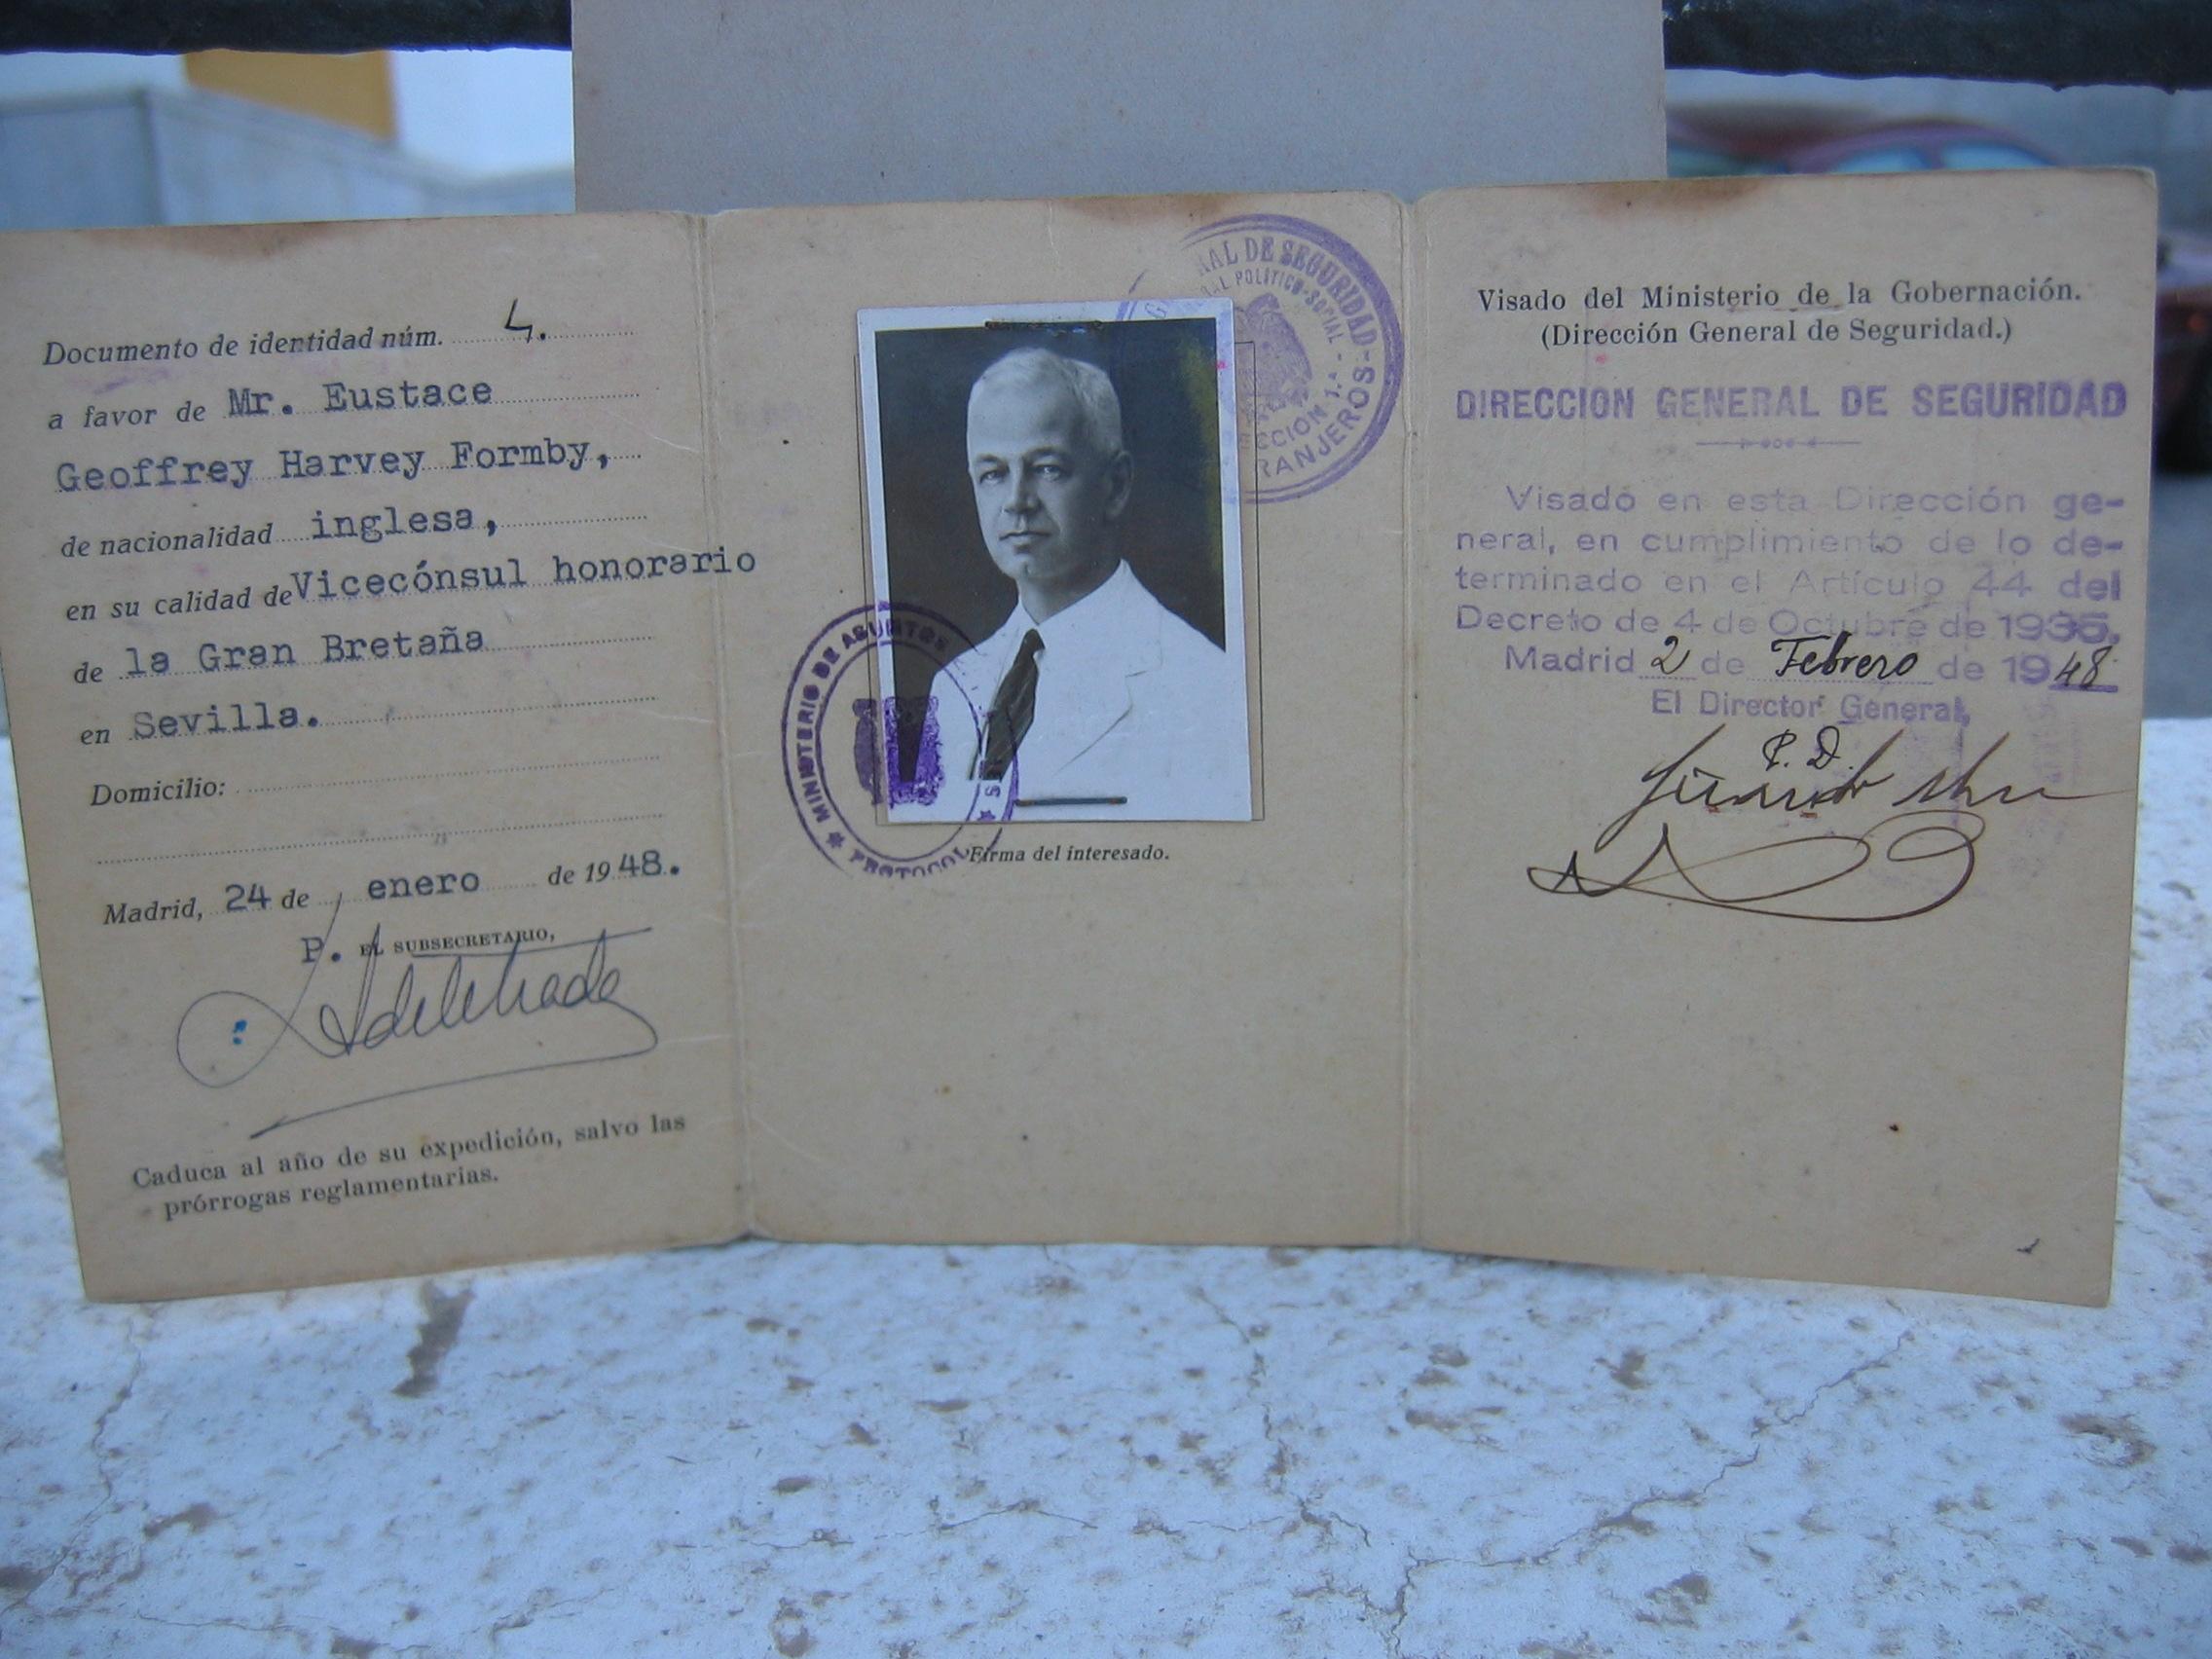 Eustace Formby, Vice-Consul, Great Britain